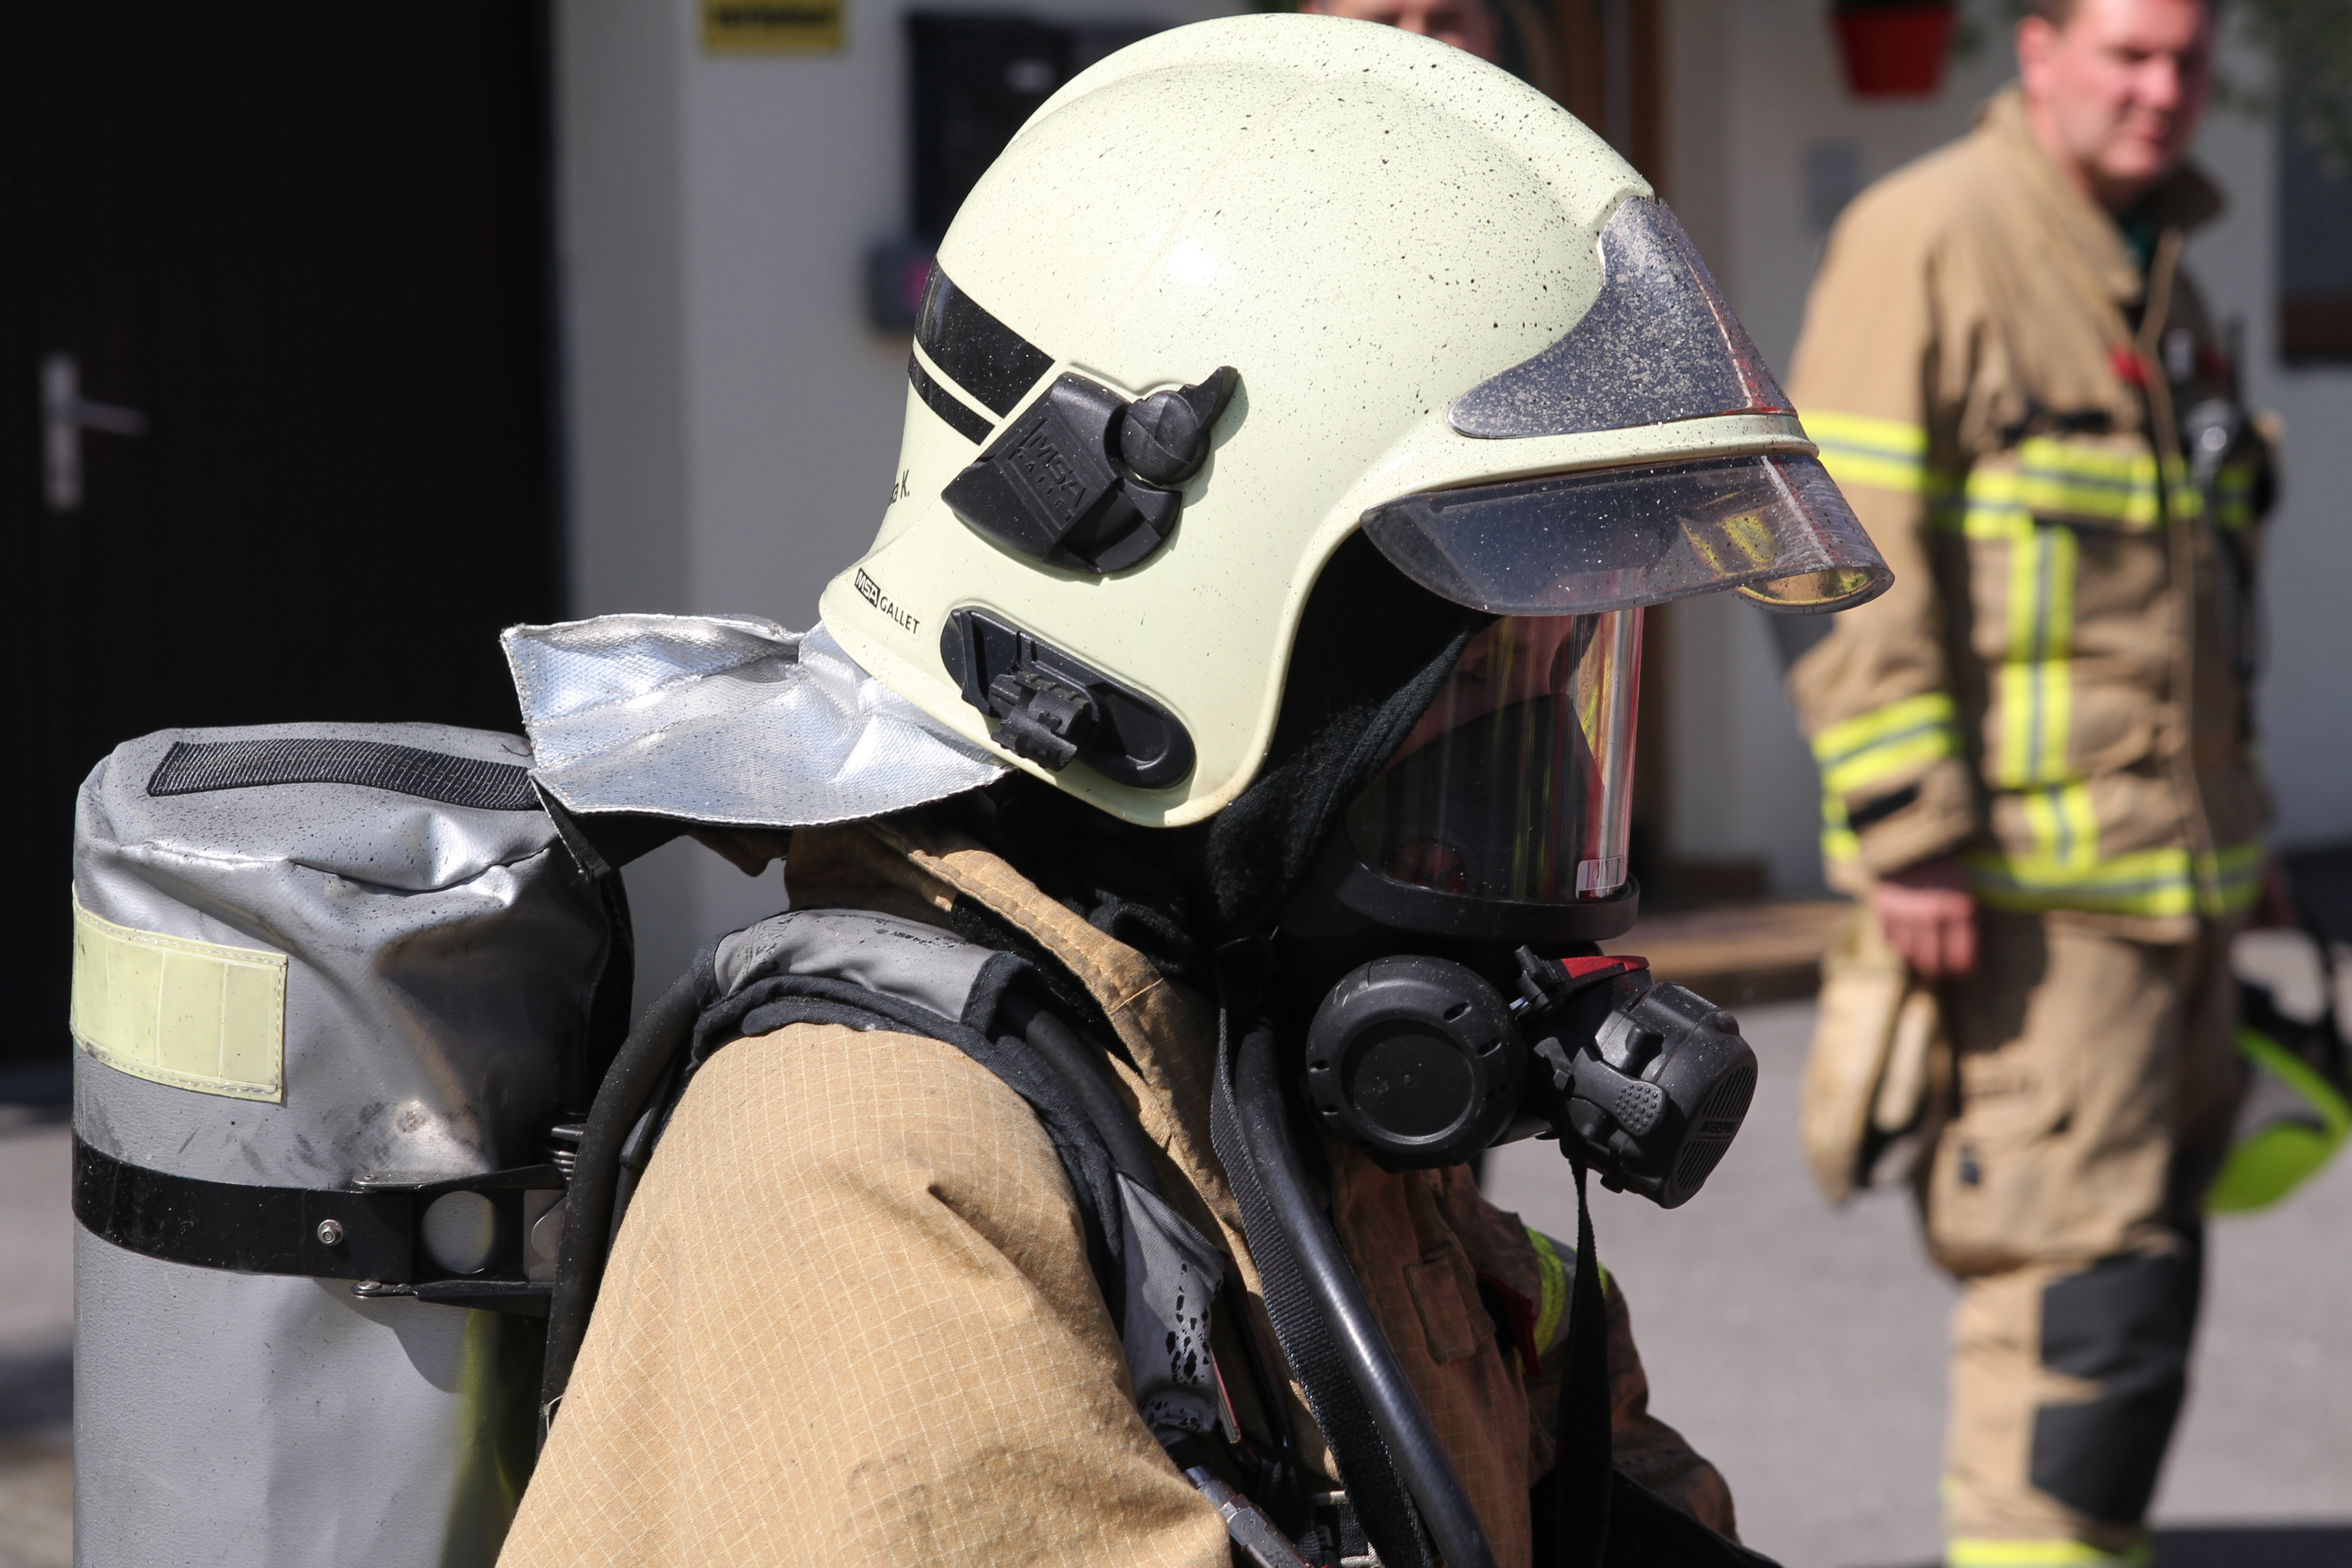 Brand-Alarm in Dornbirn: Poolabdeckung verschmort